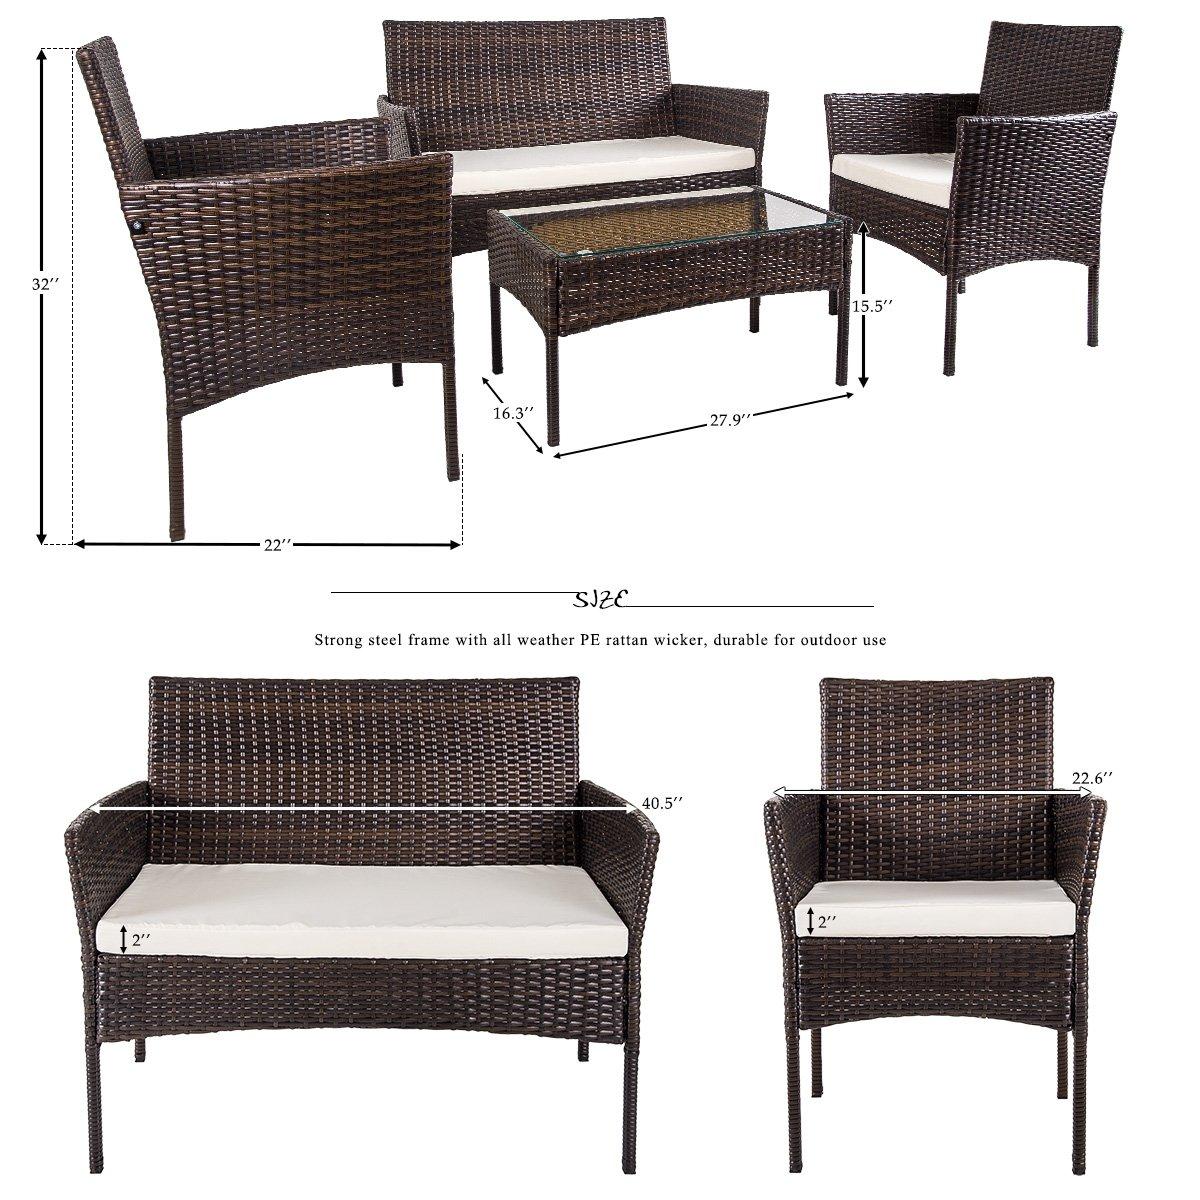 Merax 4 PC Outdoor Garden Rattan Patio Furniture Set Cushioned Seat Wicker Sofa (Brown) by Merax (Image #7)